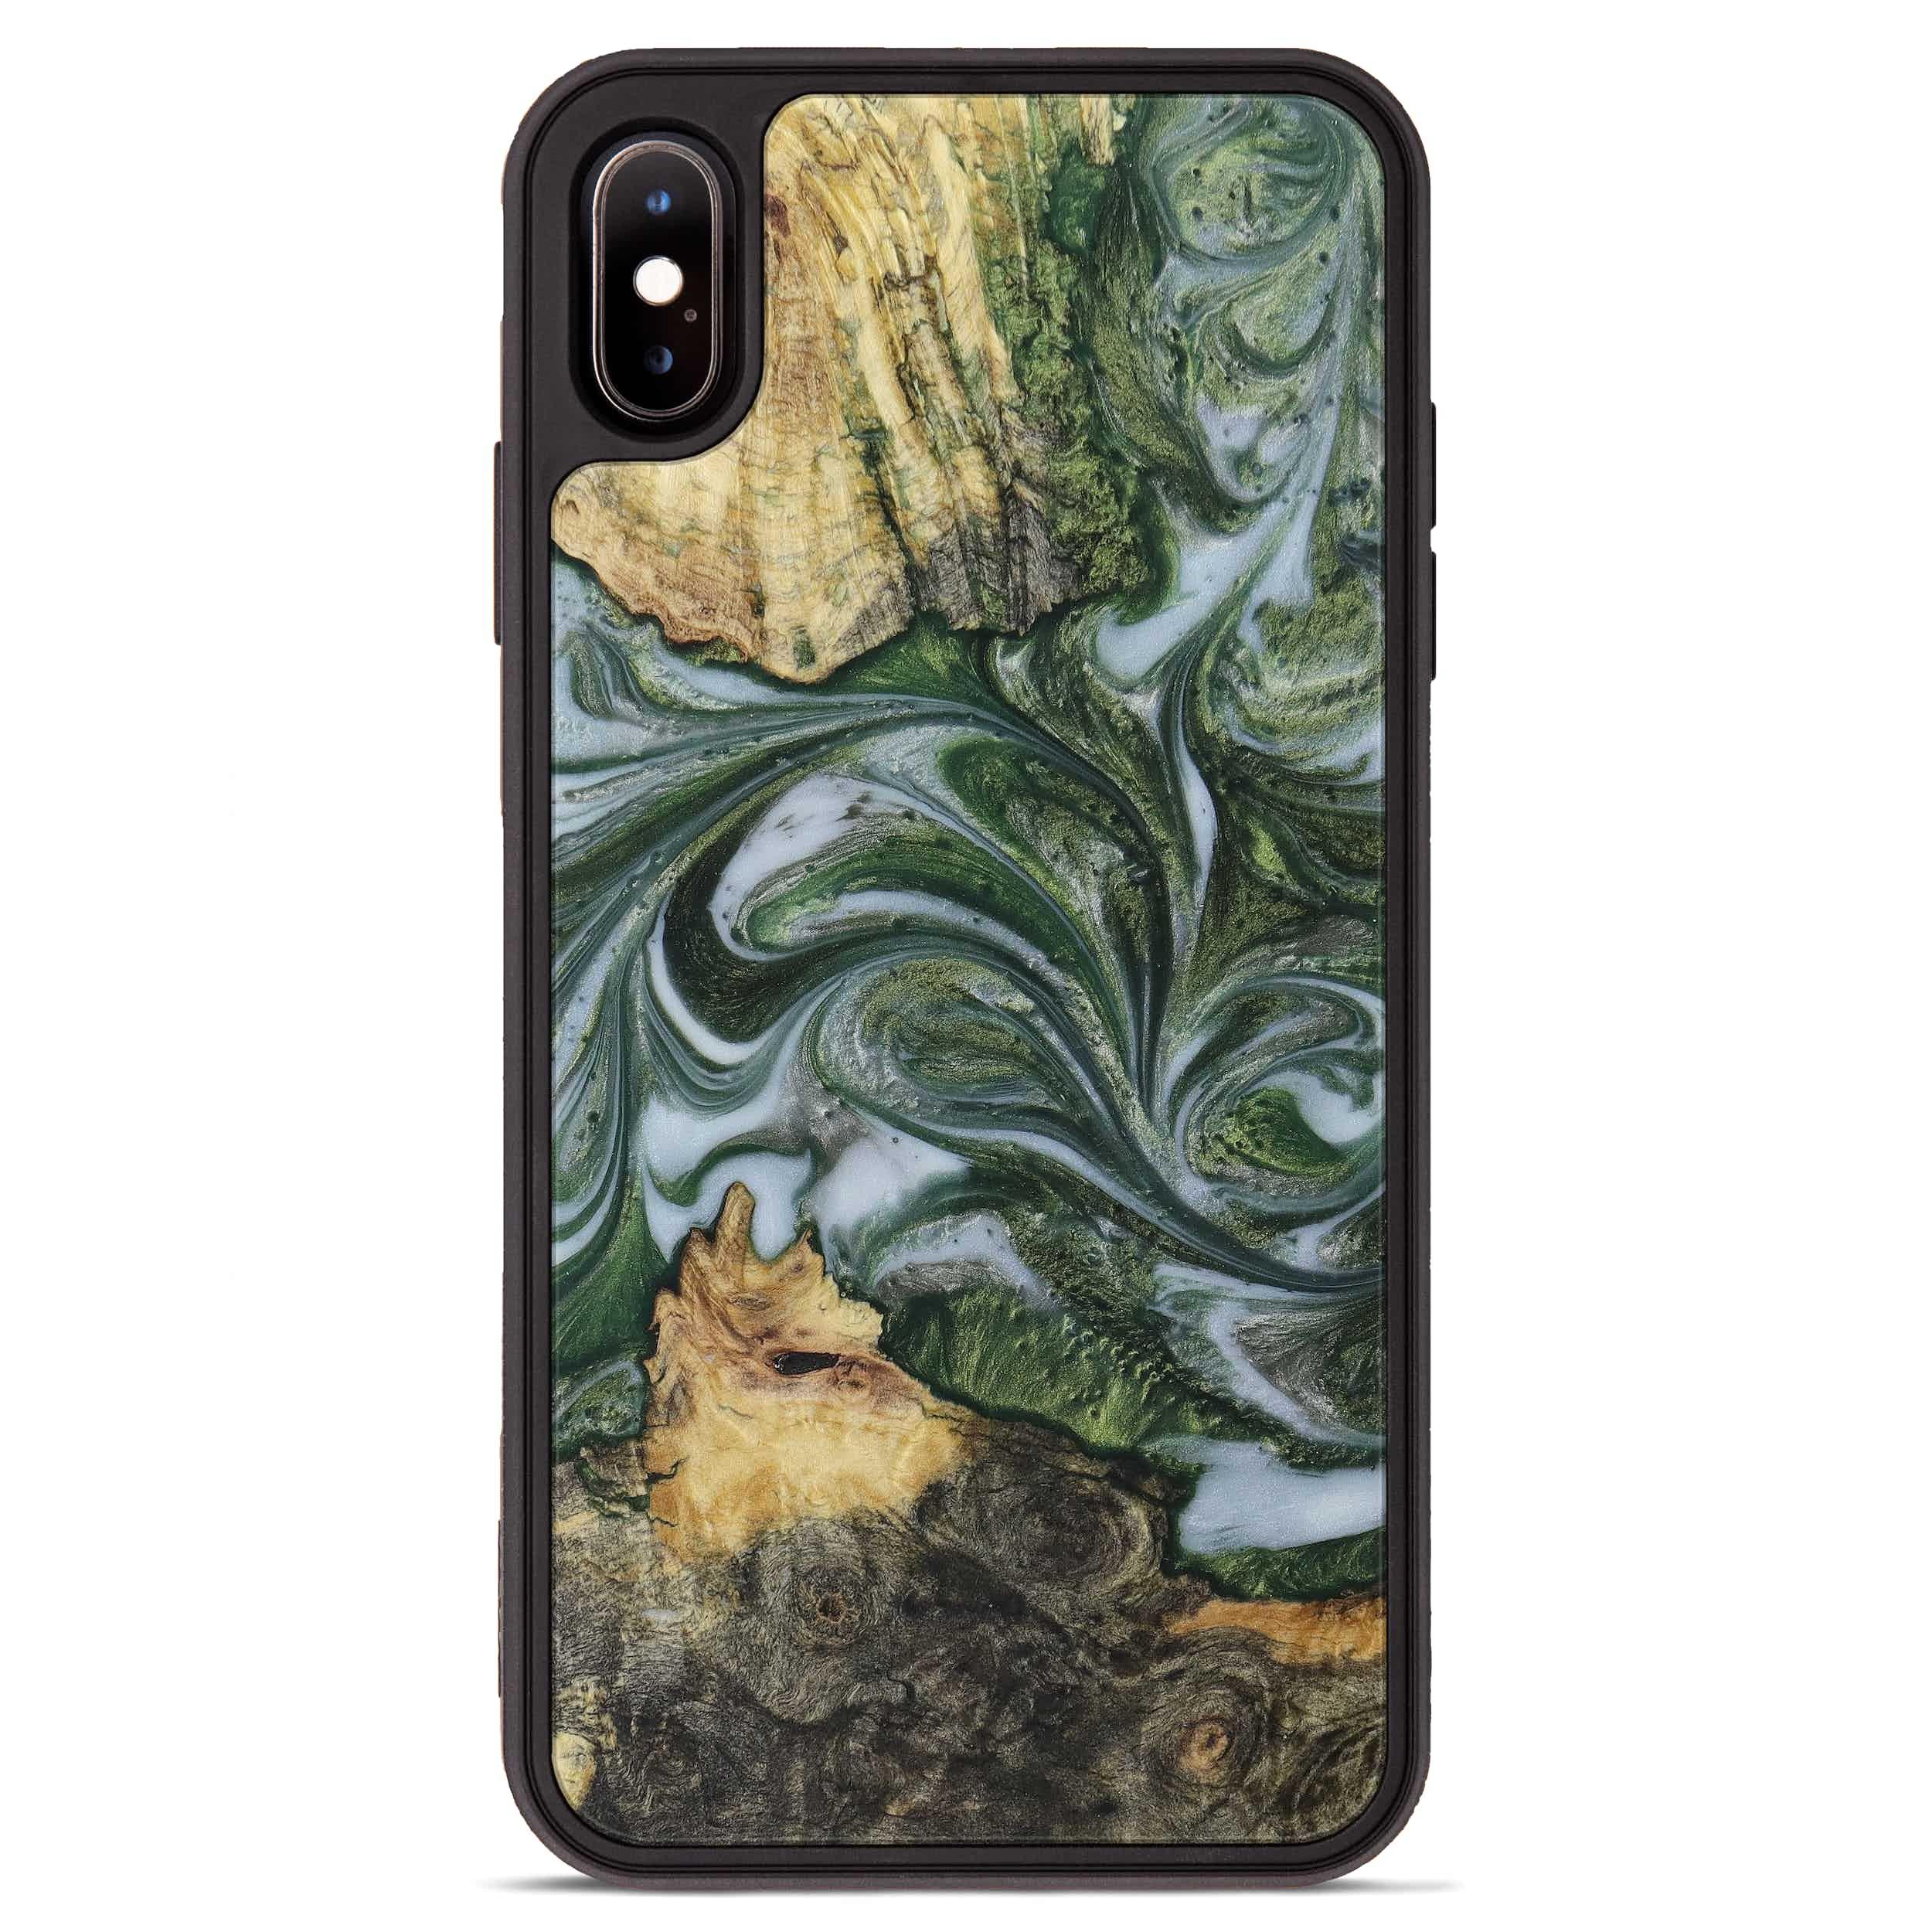 iPhone Xs Max Wood+Resin Phone Case - Barbie (Dark Green, 396000)